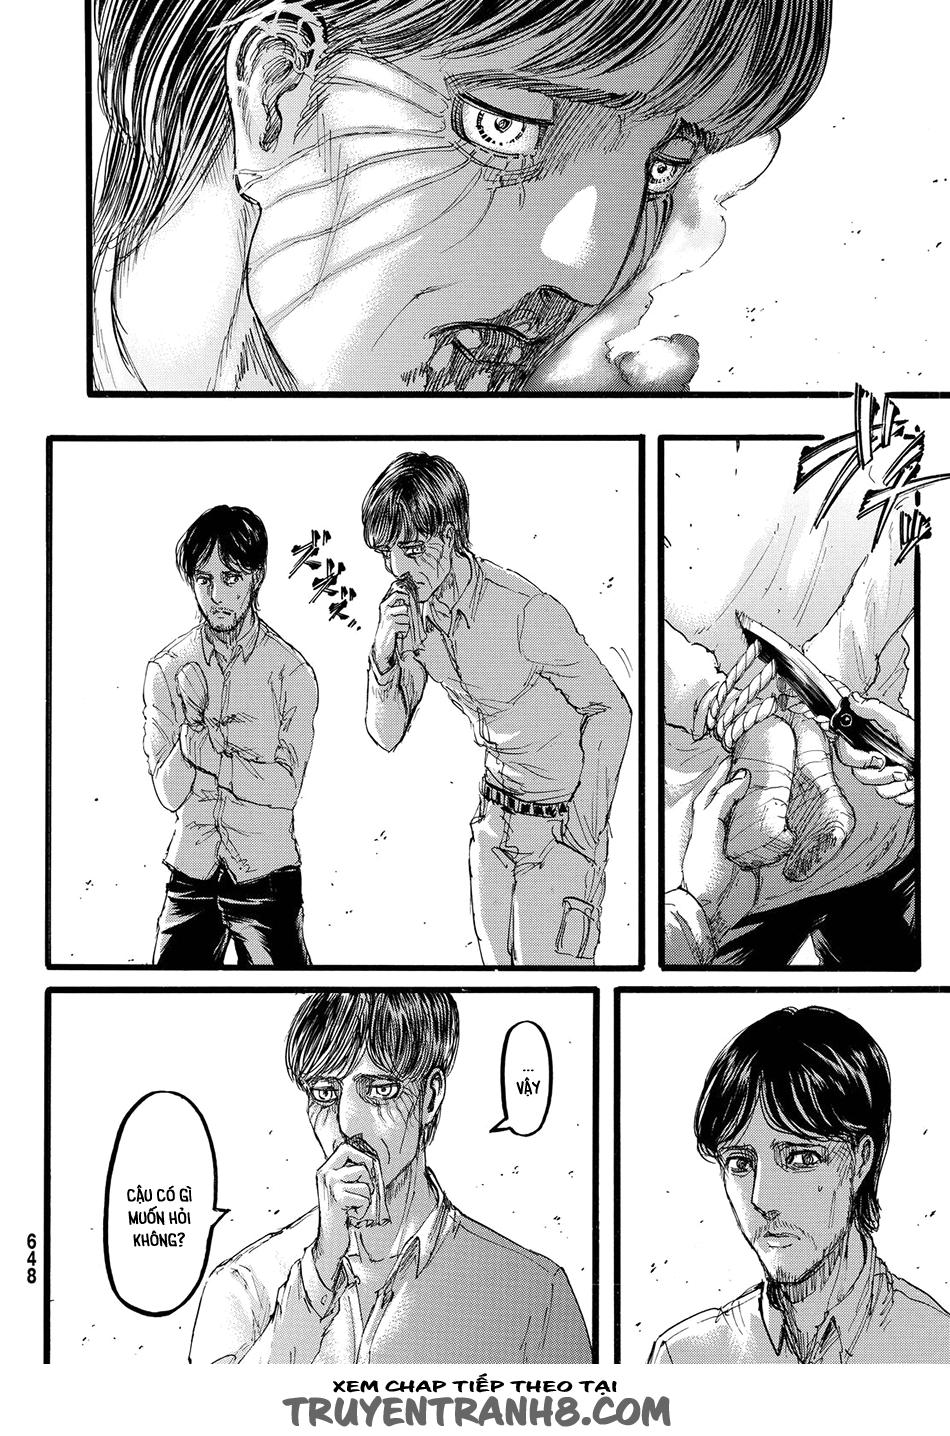 Shingeki no Kyojin - Attack on Titan Chap 88 page 6 Congtruyen24h